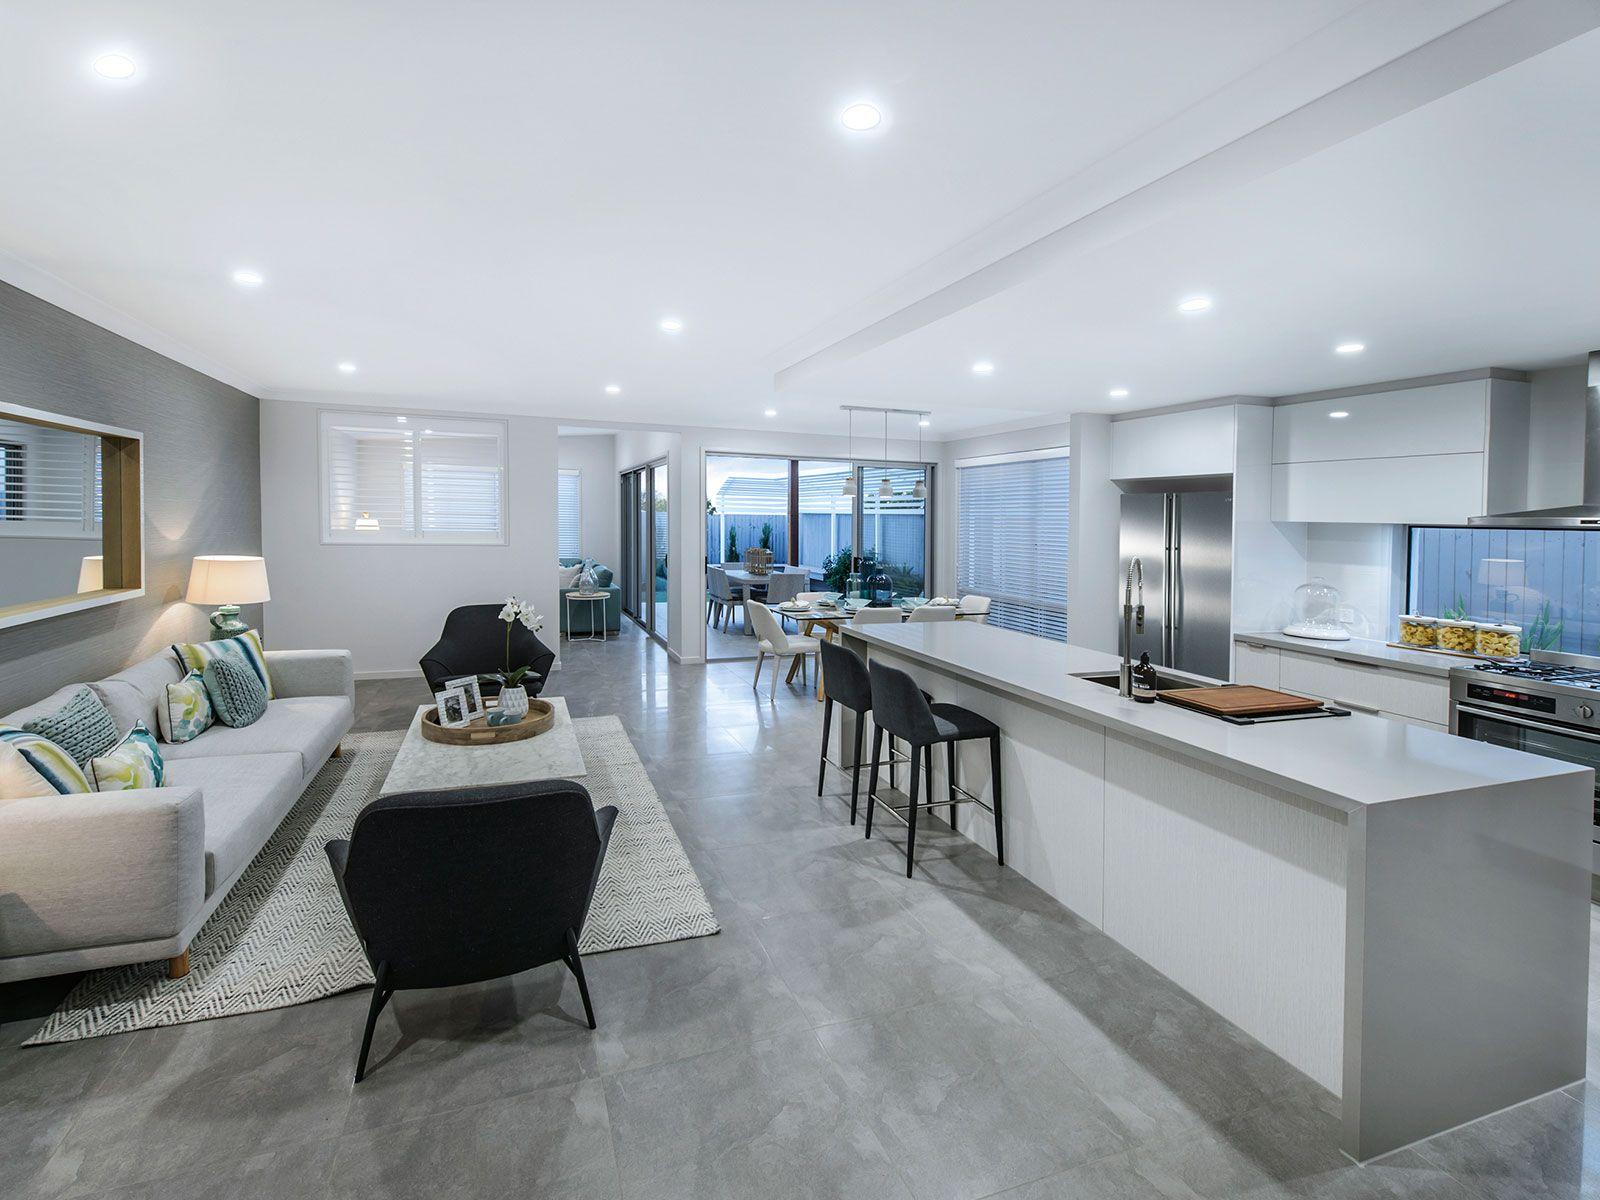 display kitchens for sale brisbane